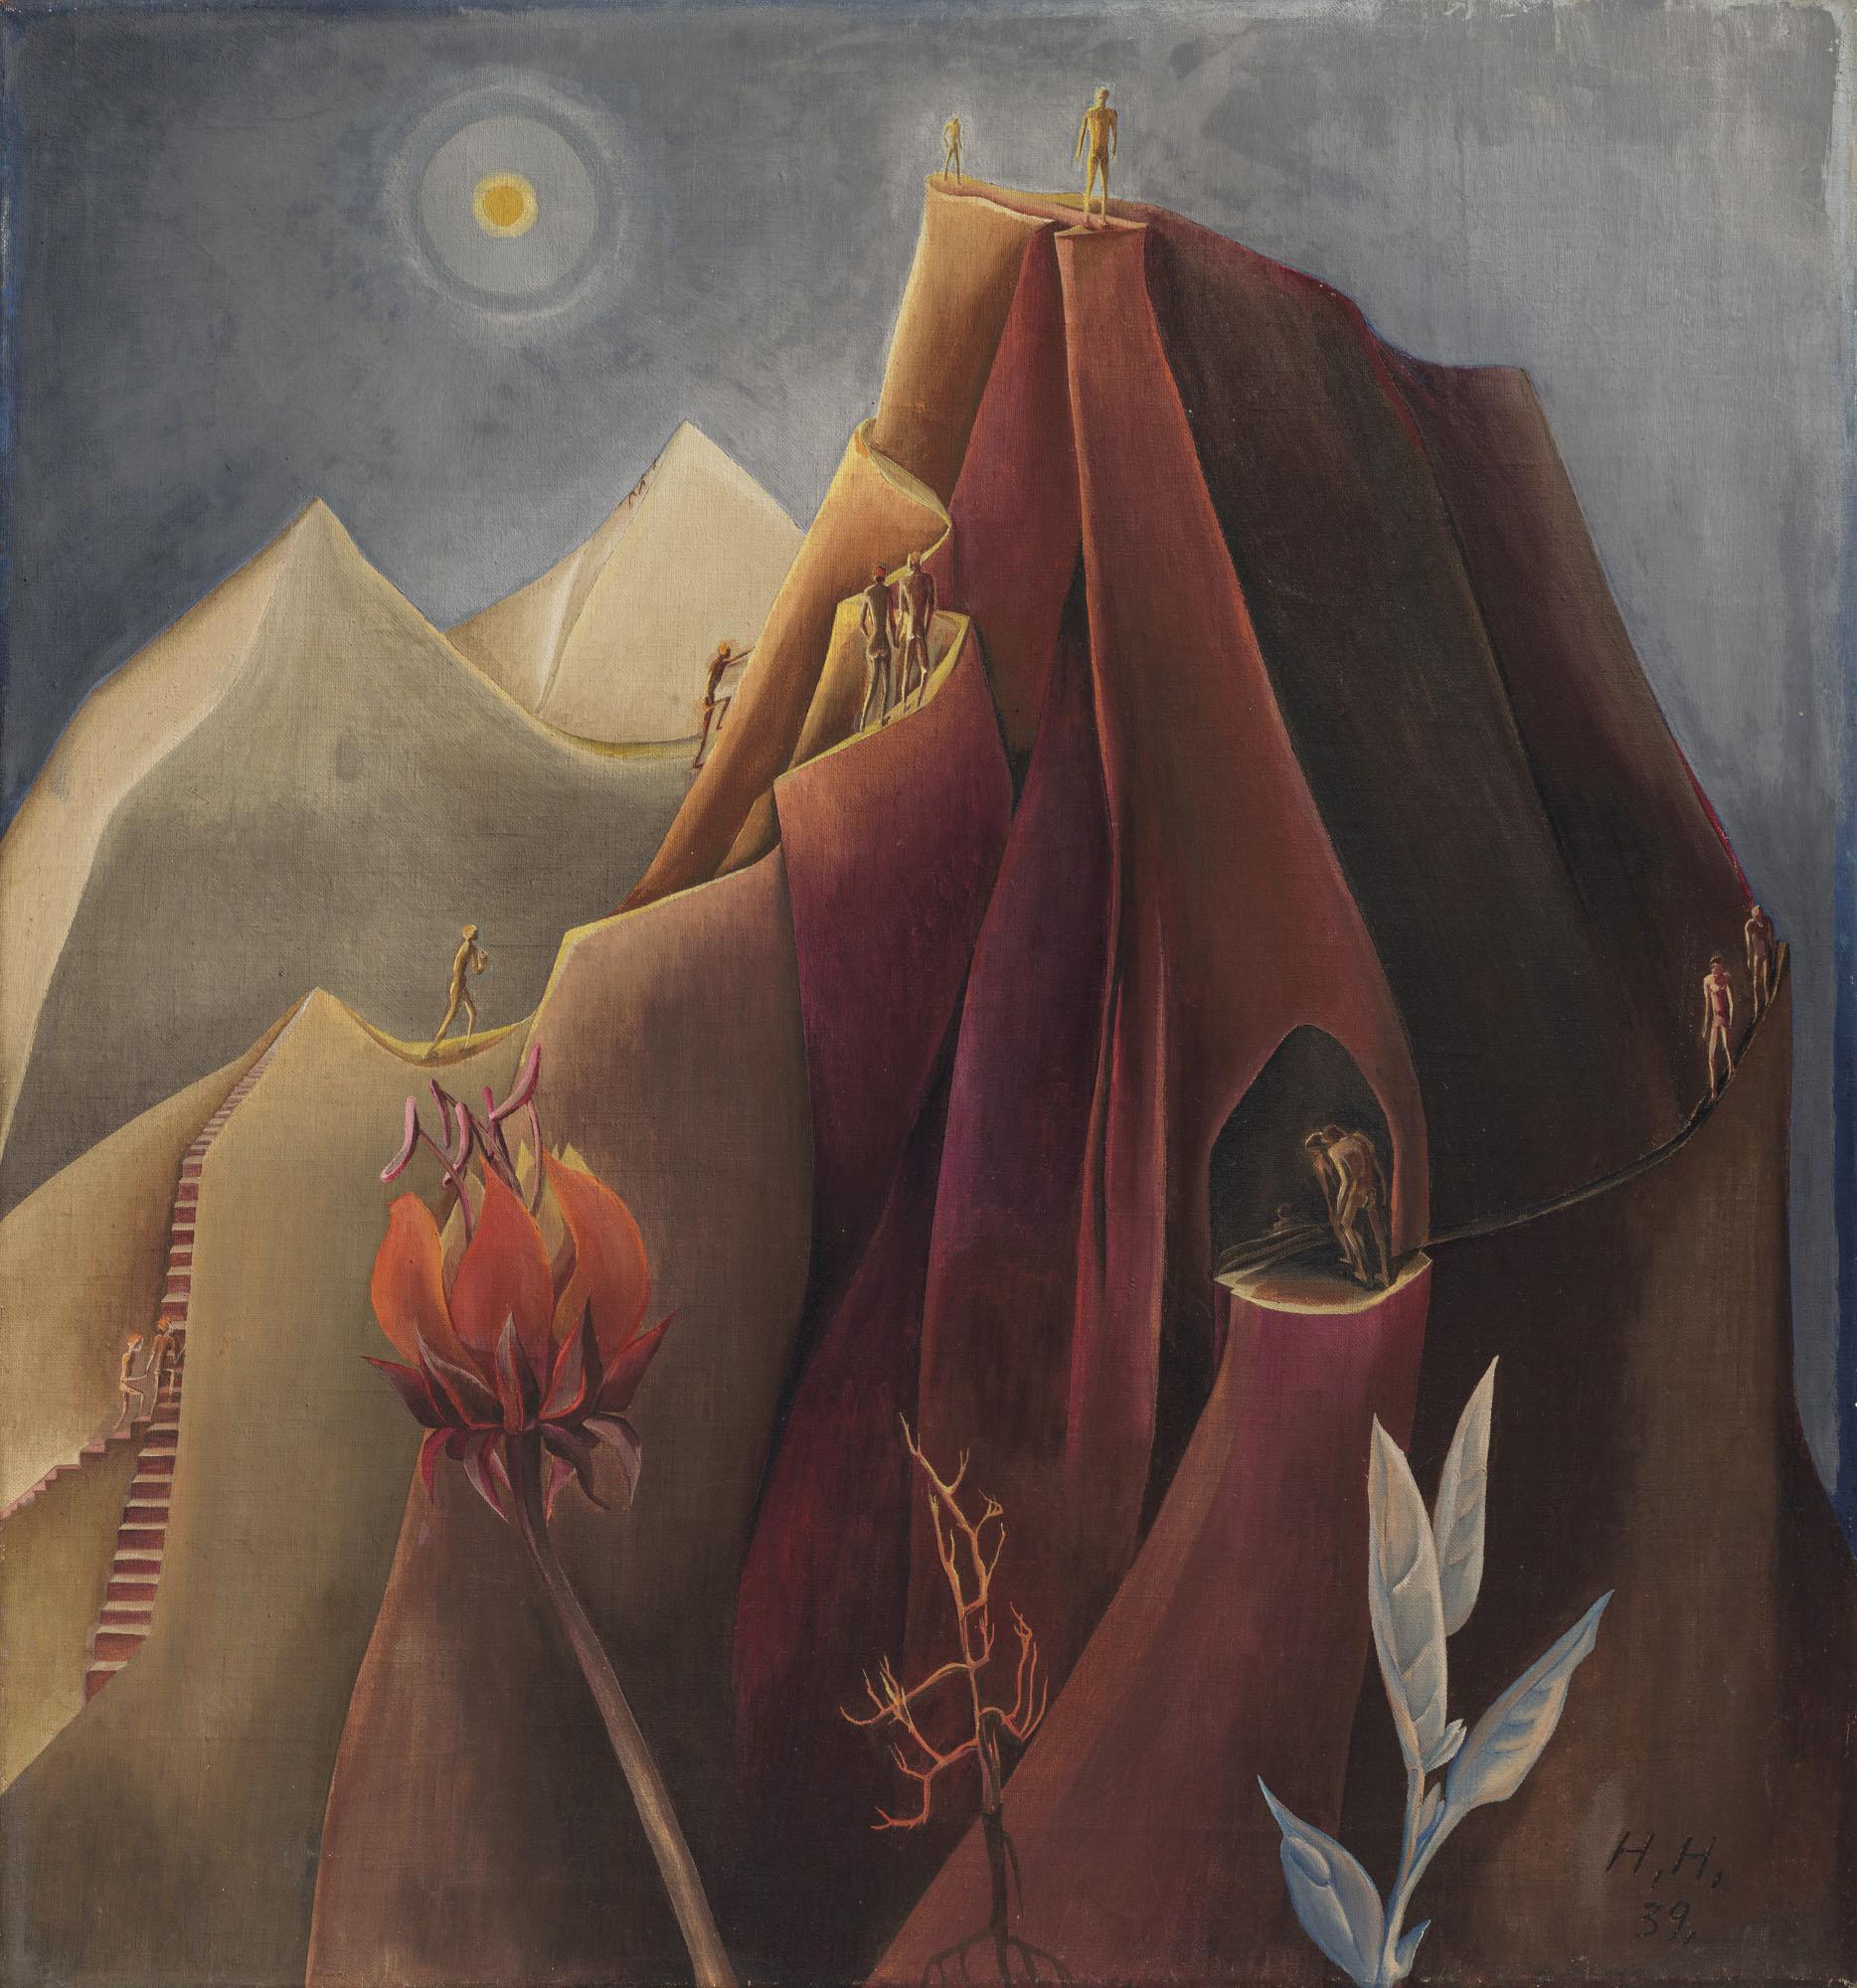 HANNAH HÖCH (1889-1978)